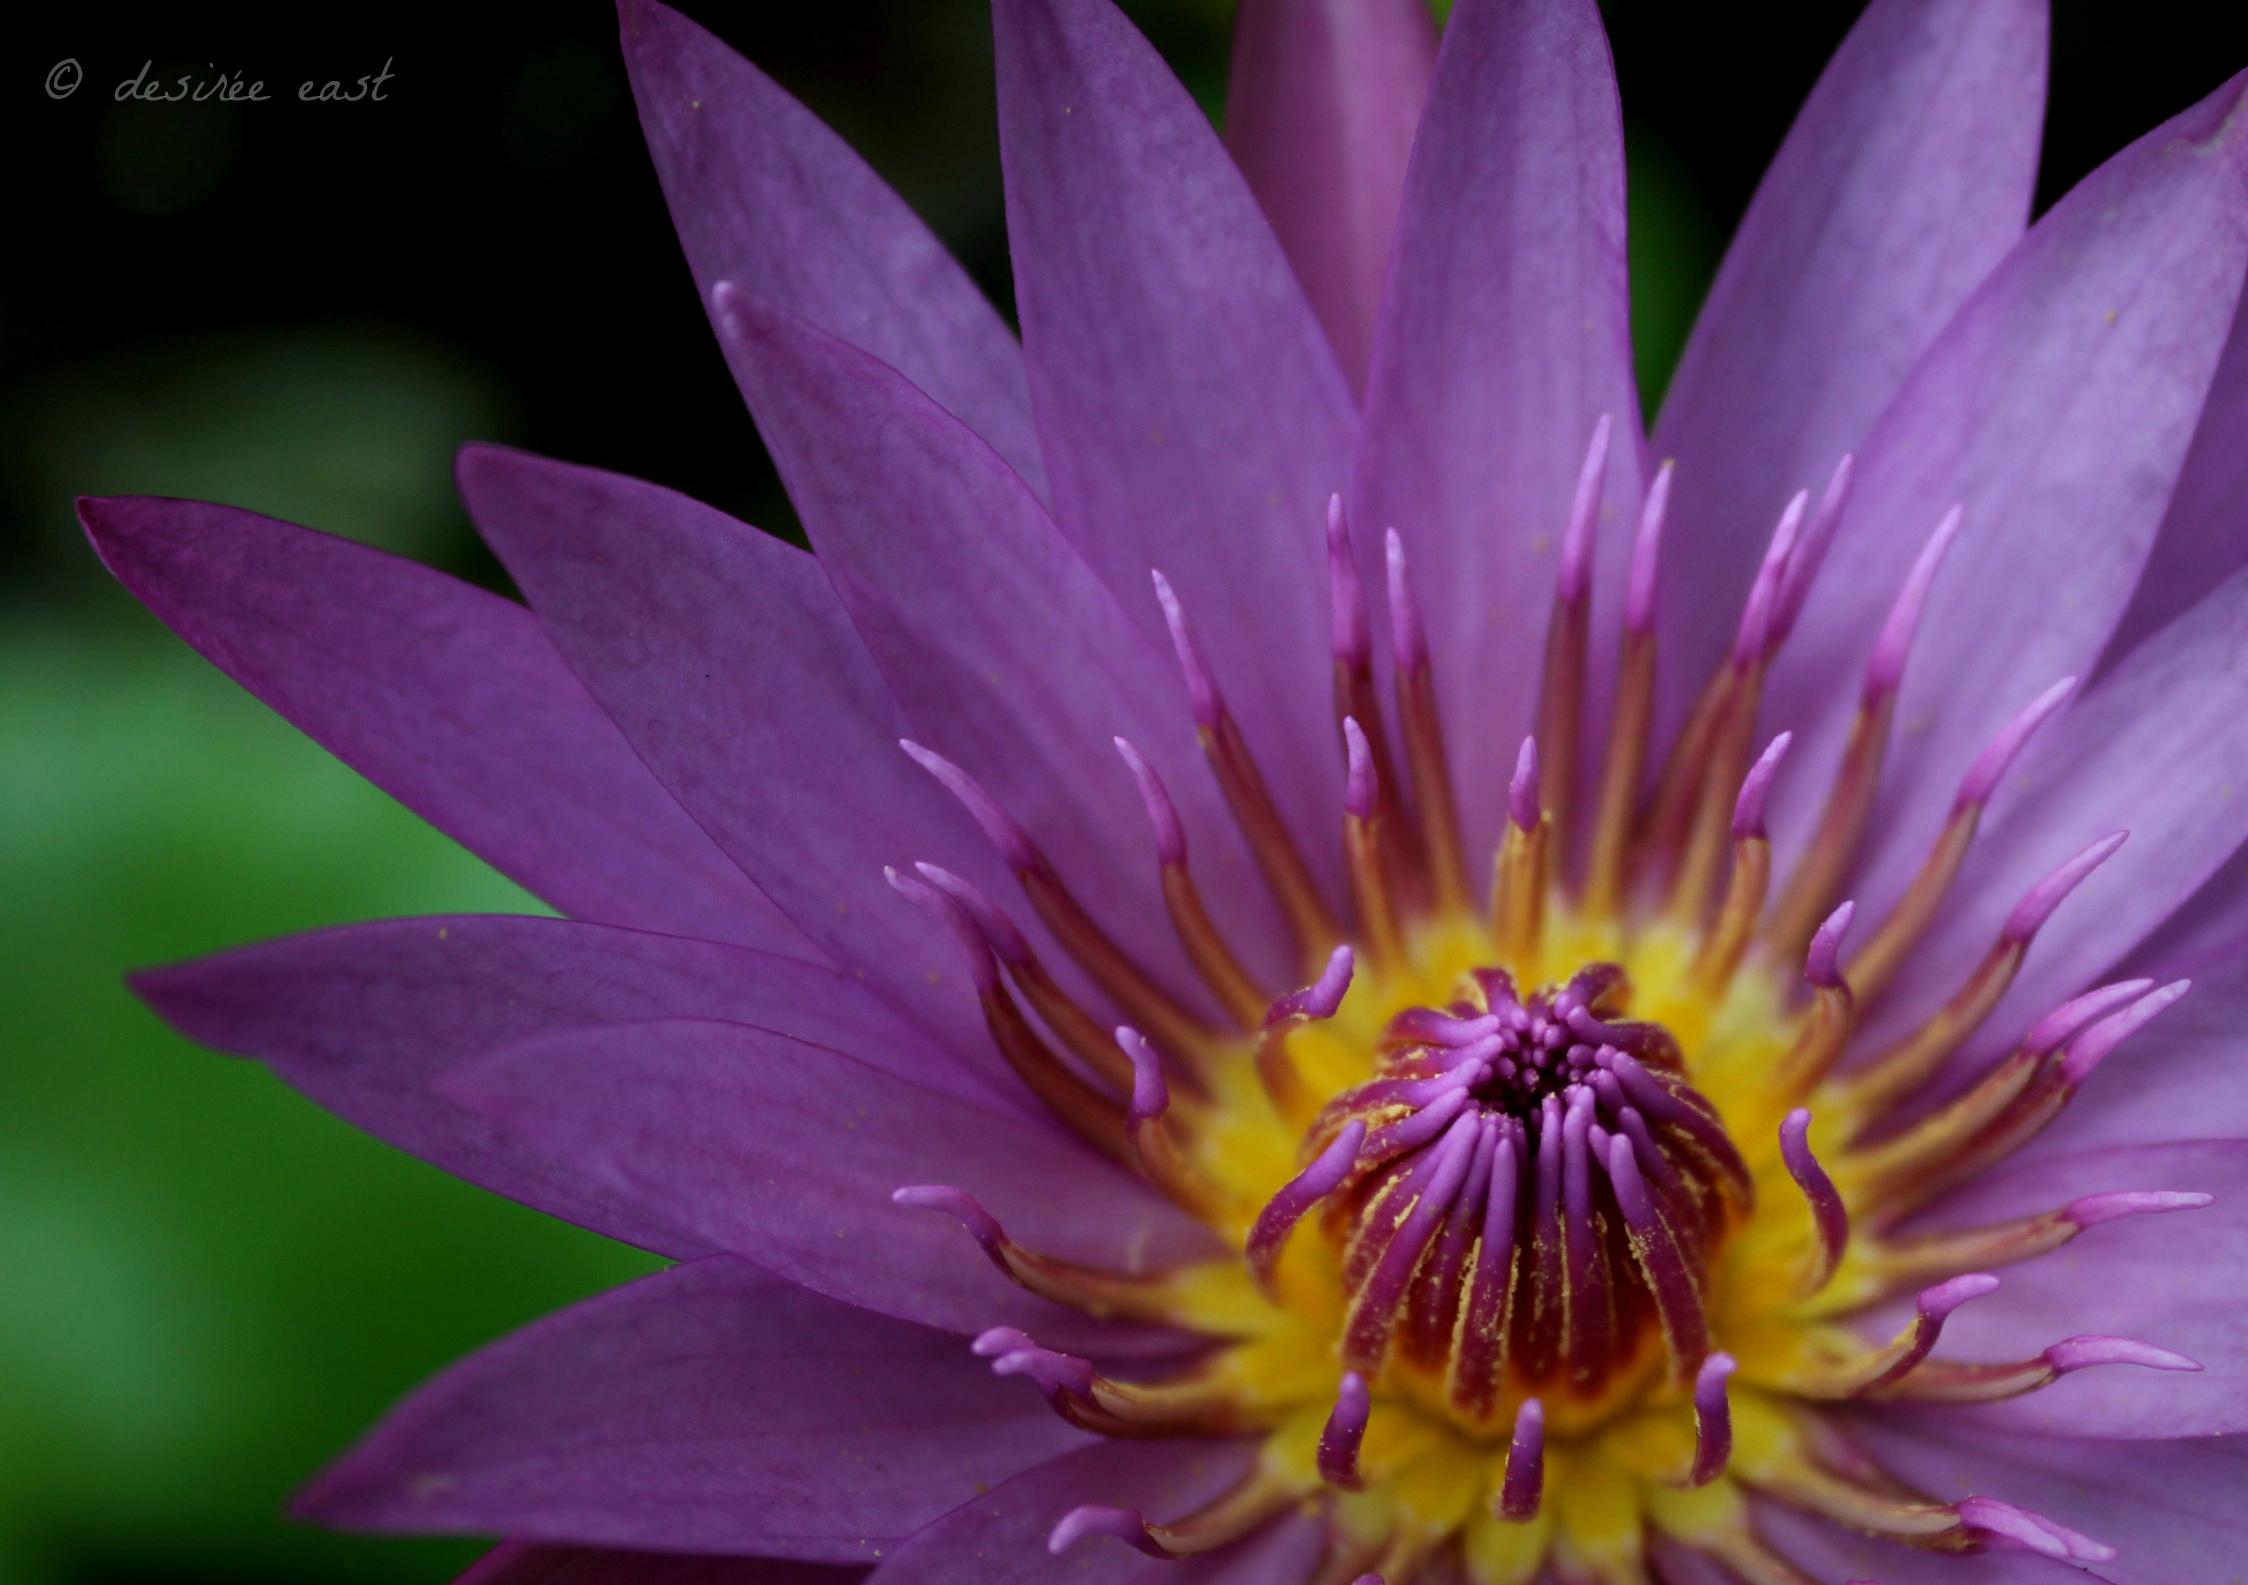 weekly-photo-challenge_purple_photo-by-desiree-east.jpg